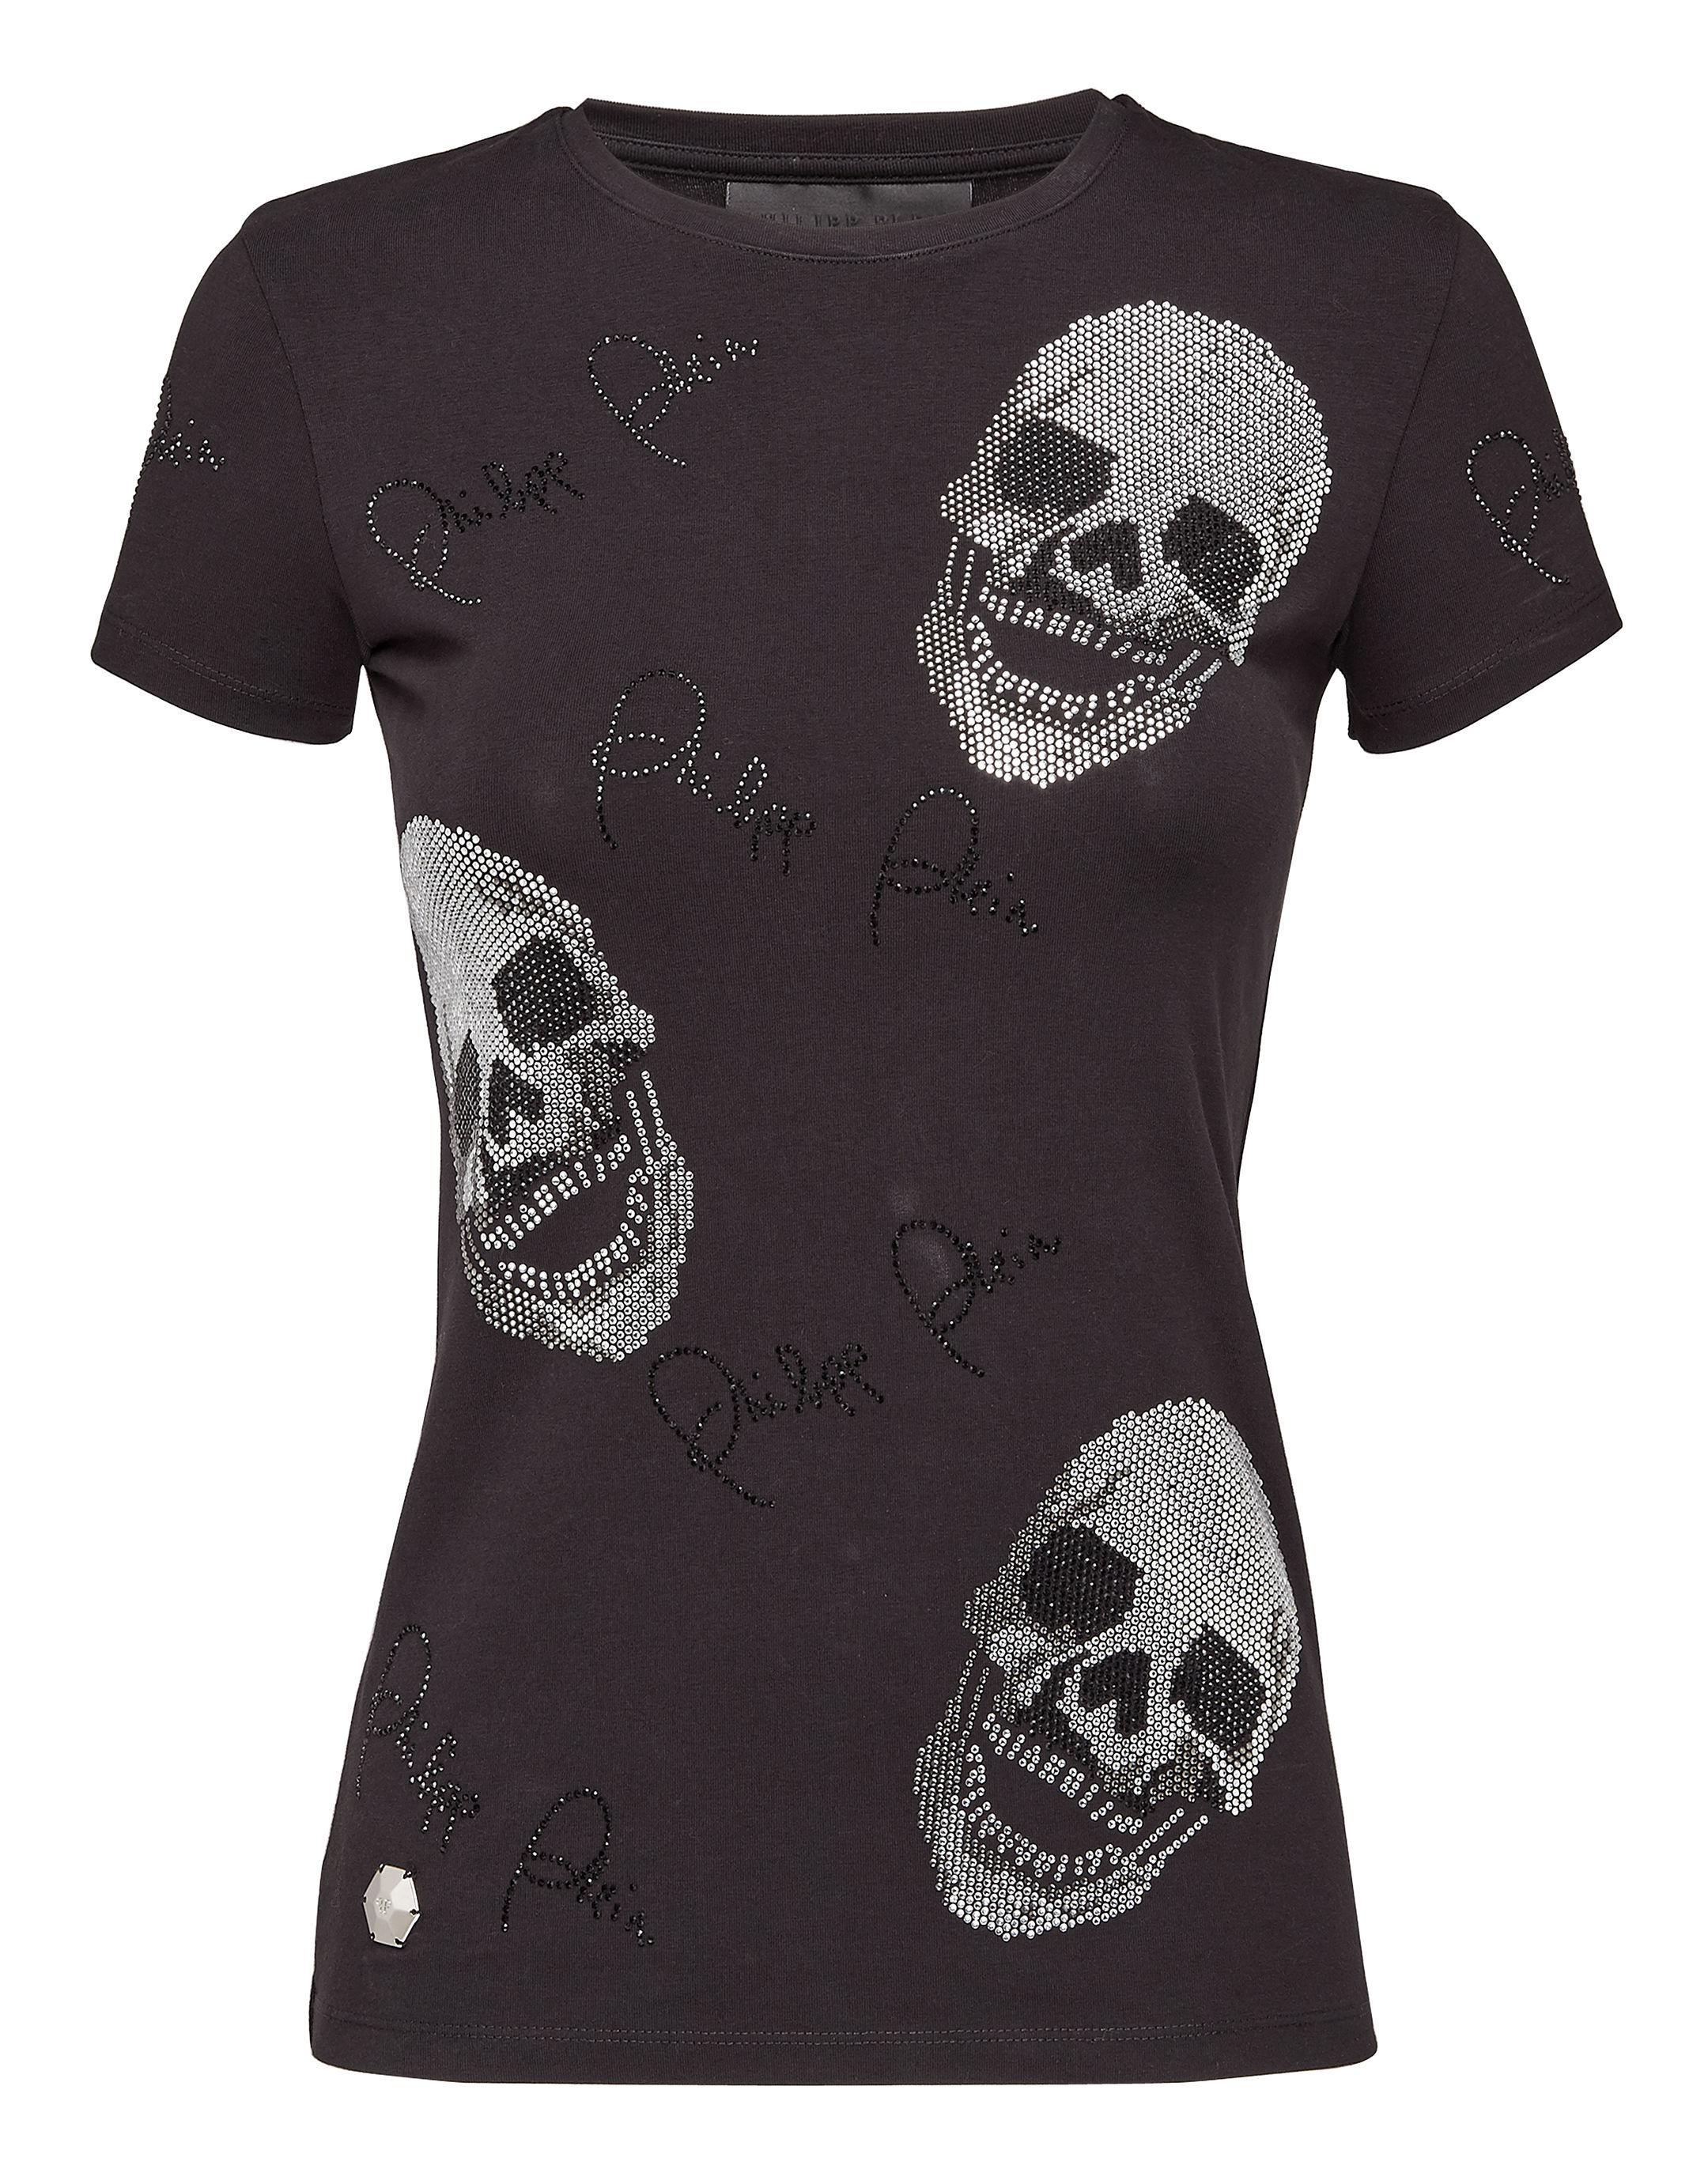 long sleeve T-shirt with metallic detailed neck - Black Philipp Plein Pictures Cheap Online aMEeFTq6Tw